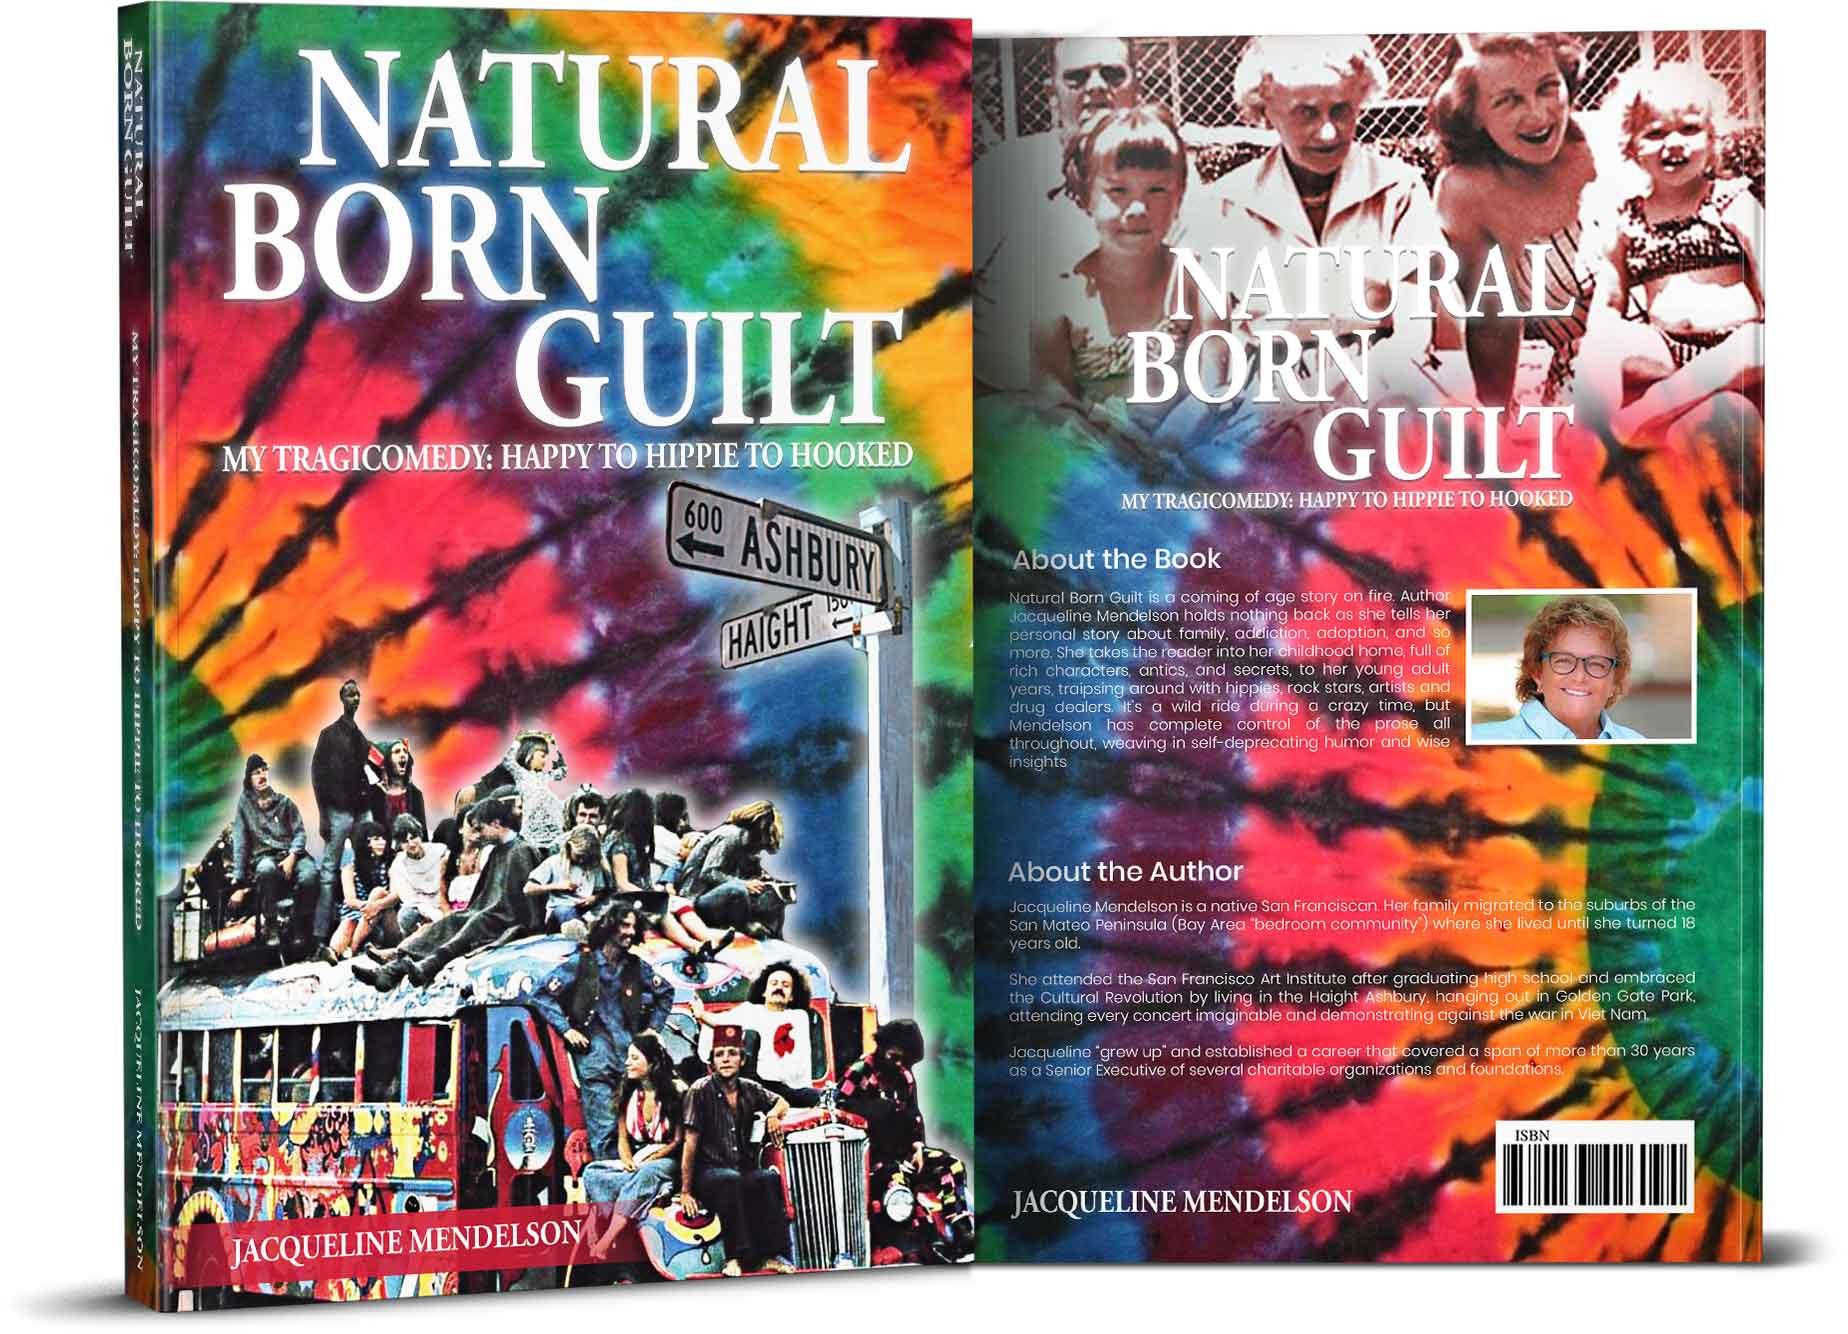 natural born guilt book cover